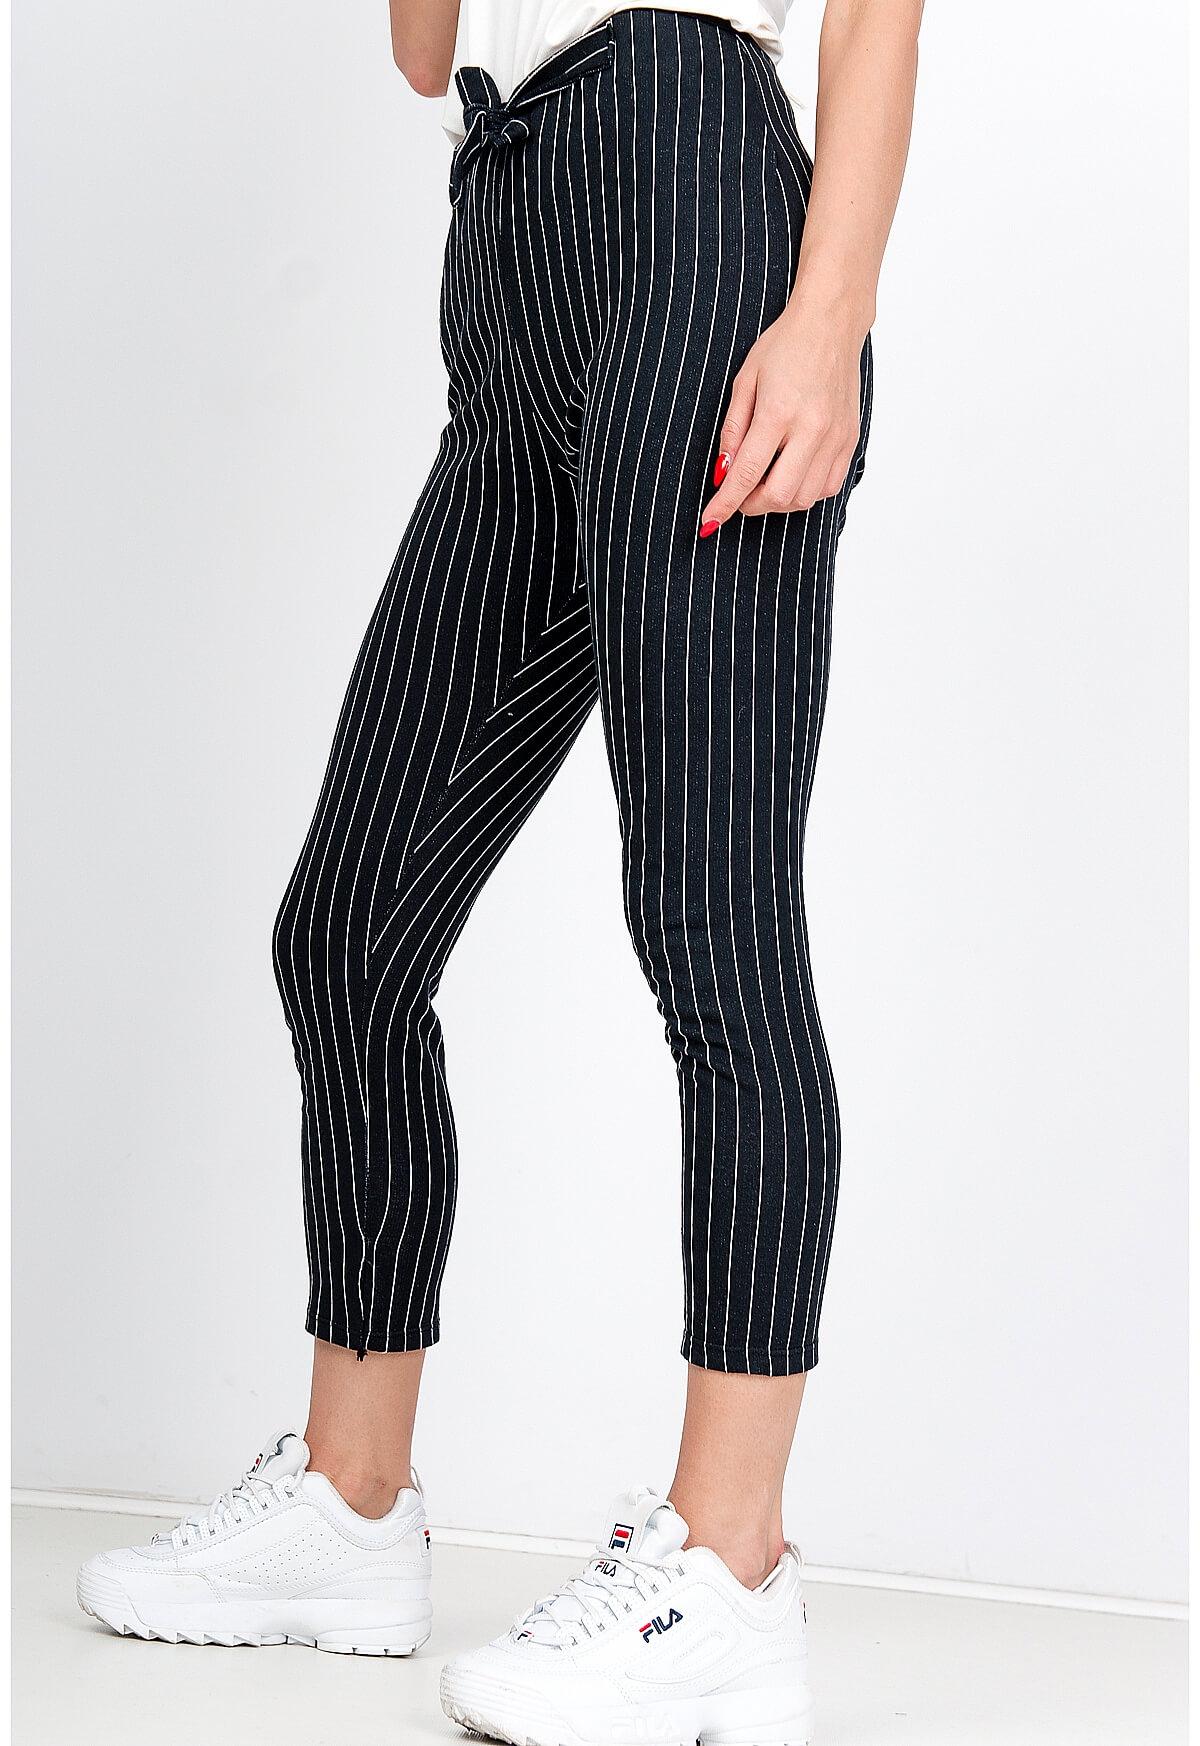 Čierne dámske nohavice s bielymi pásikmi